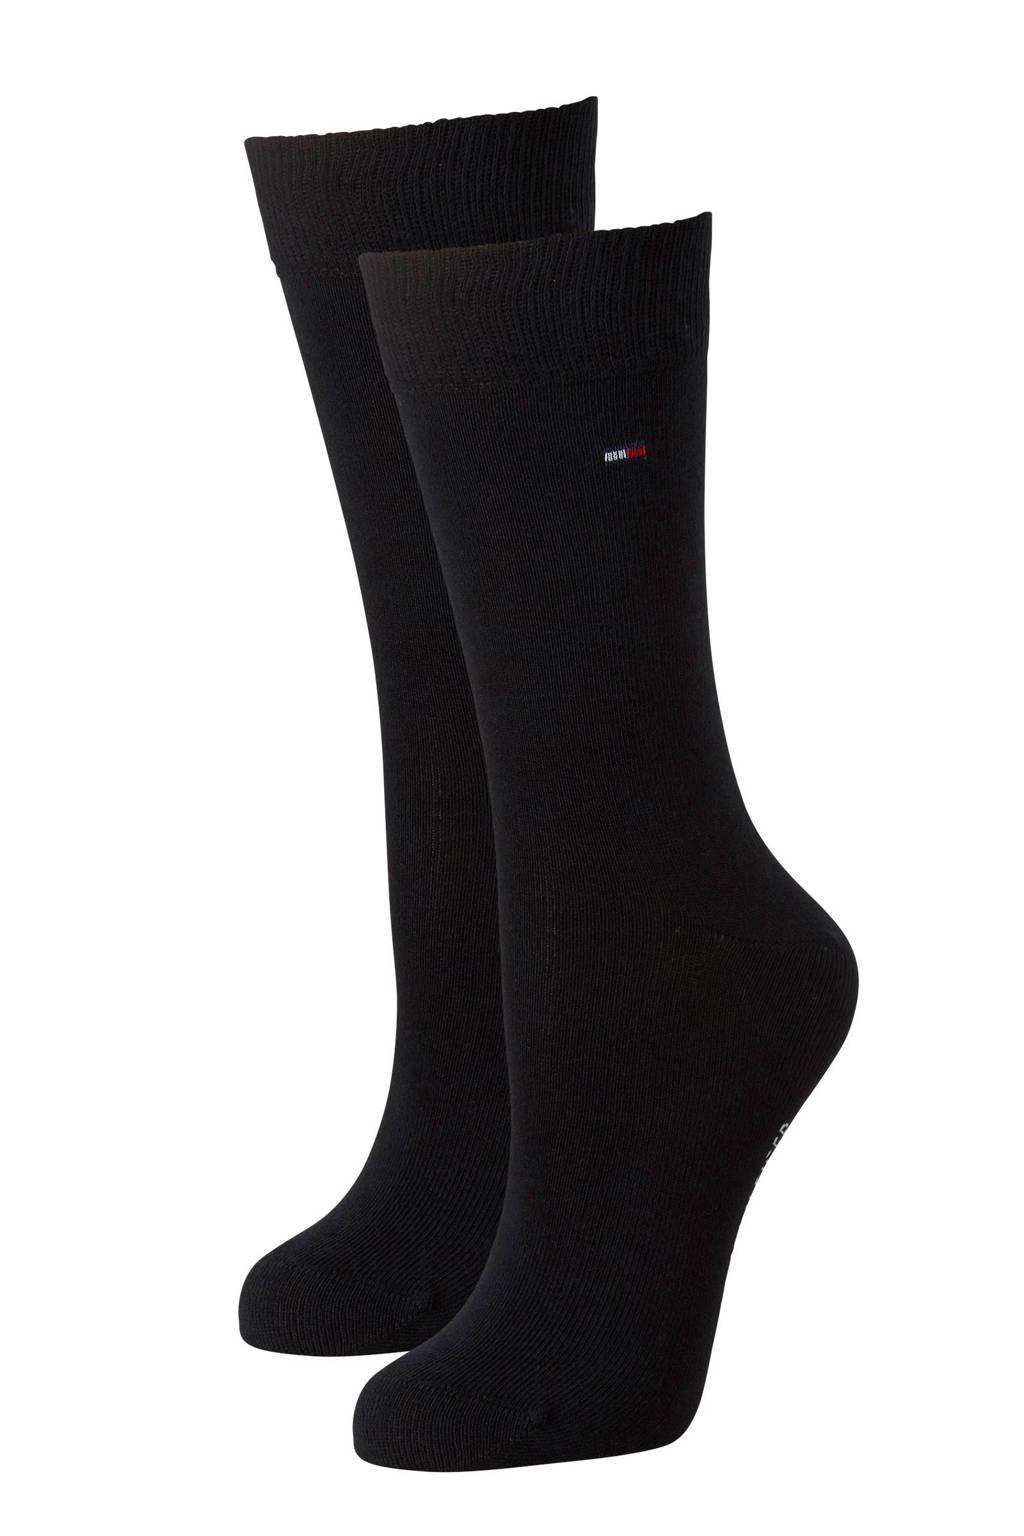 Tommy Hilfiger sokken (2 paar), Zwart